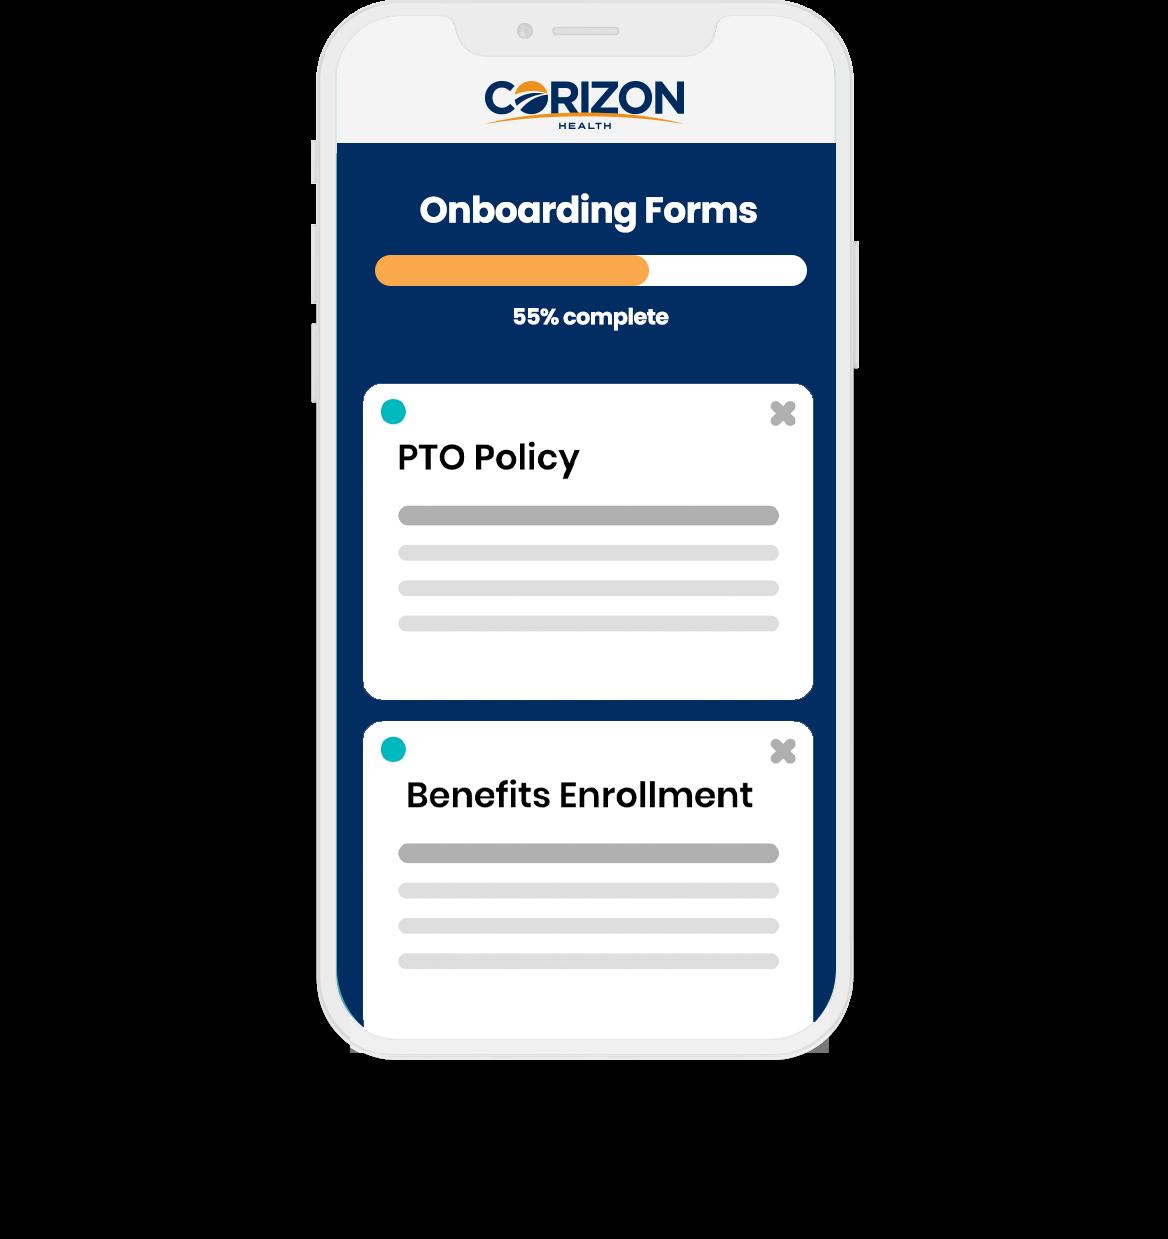 Corizon Health onboarding application